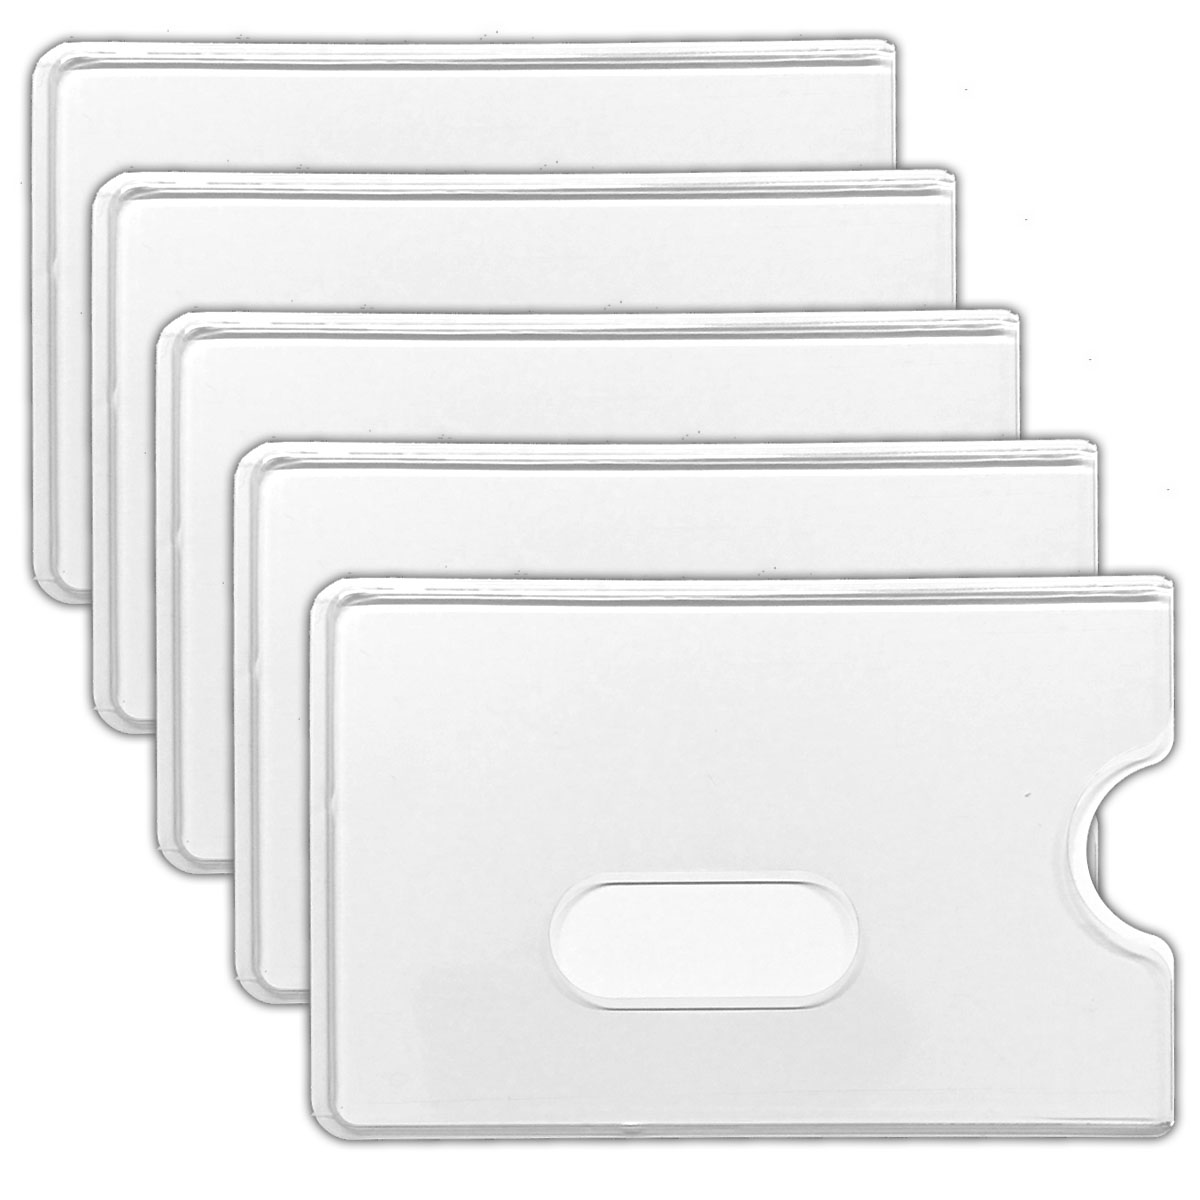 5x schutzh lle kreditkarte ec karte hartplastik. Black Bedroom Furniture Sets. Home Design Ideas